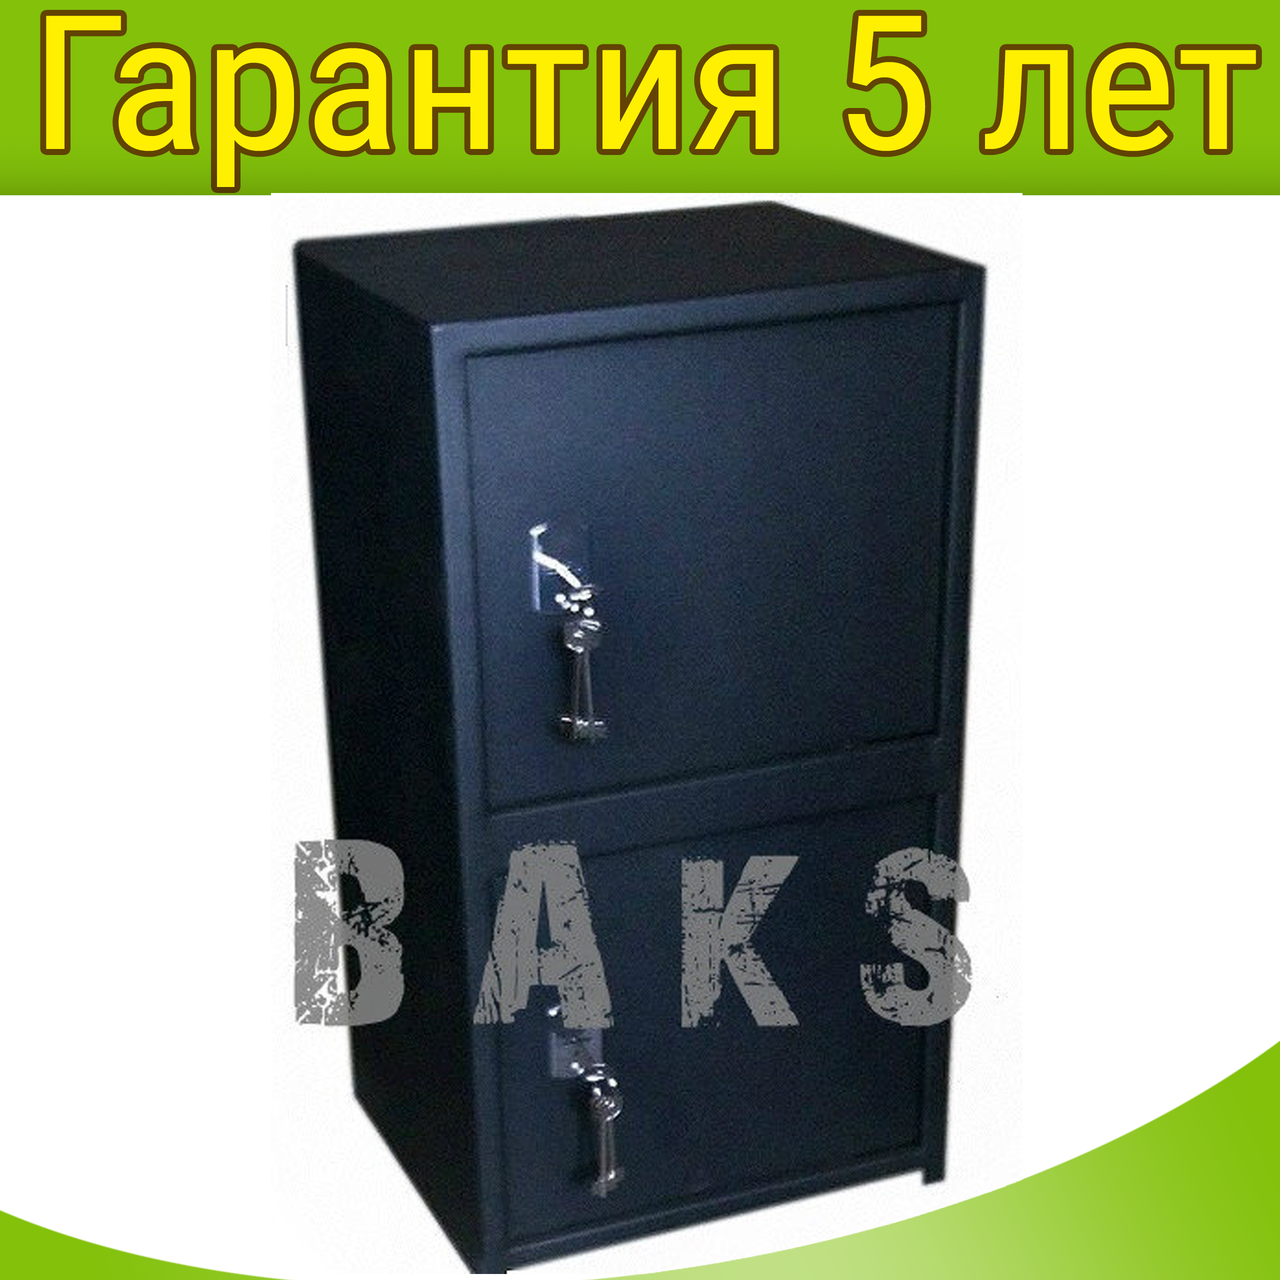 Сейф бухгалтерский Б-72/2ПП